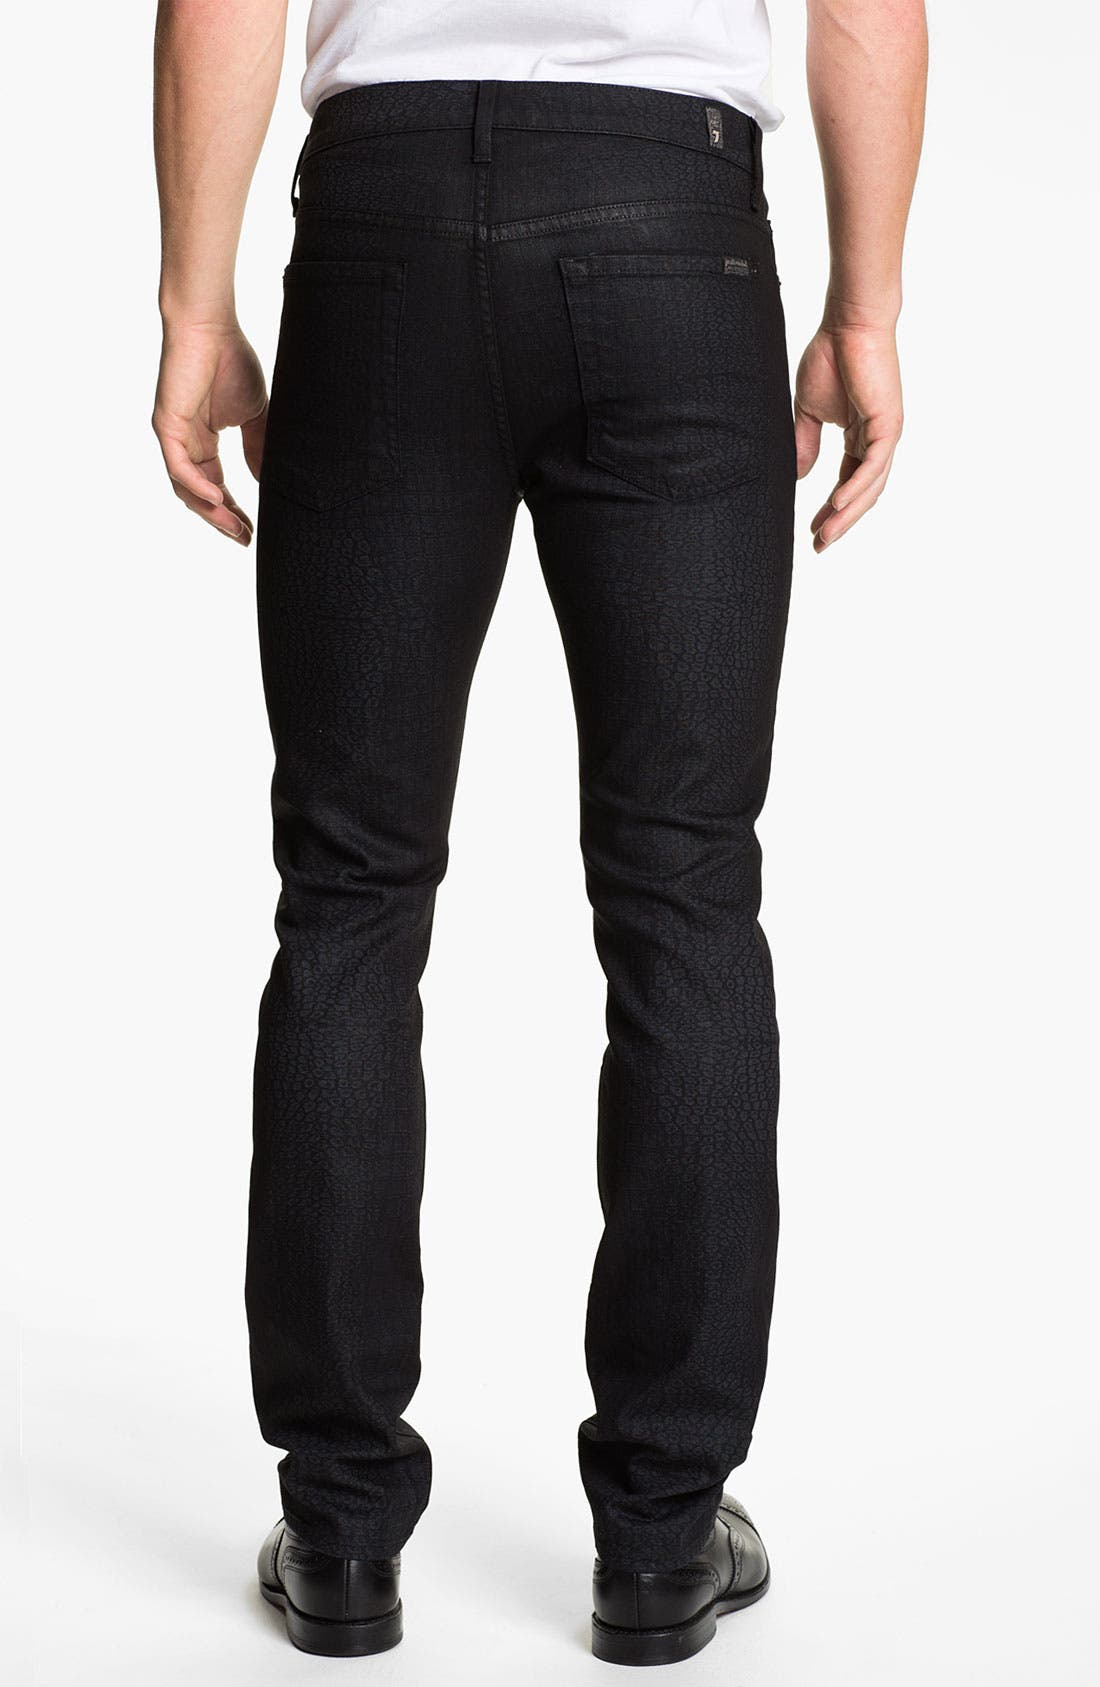 Alternate Image 1 Selected - 7 For All Mankind® 'Rhigby' Slim Straight Leg Jeans (Dark Indigo)